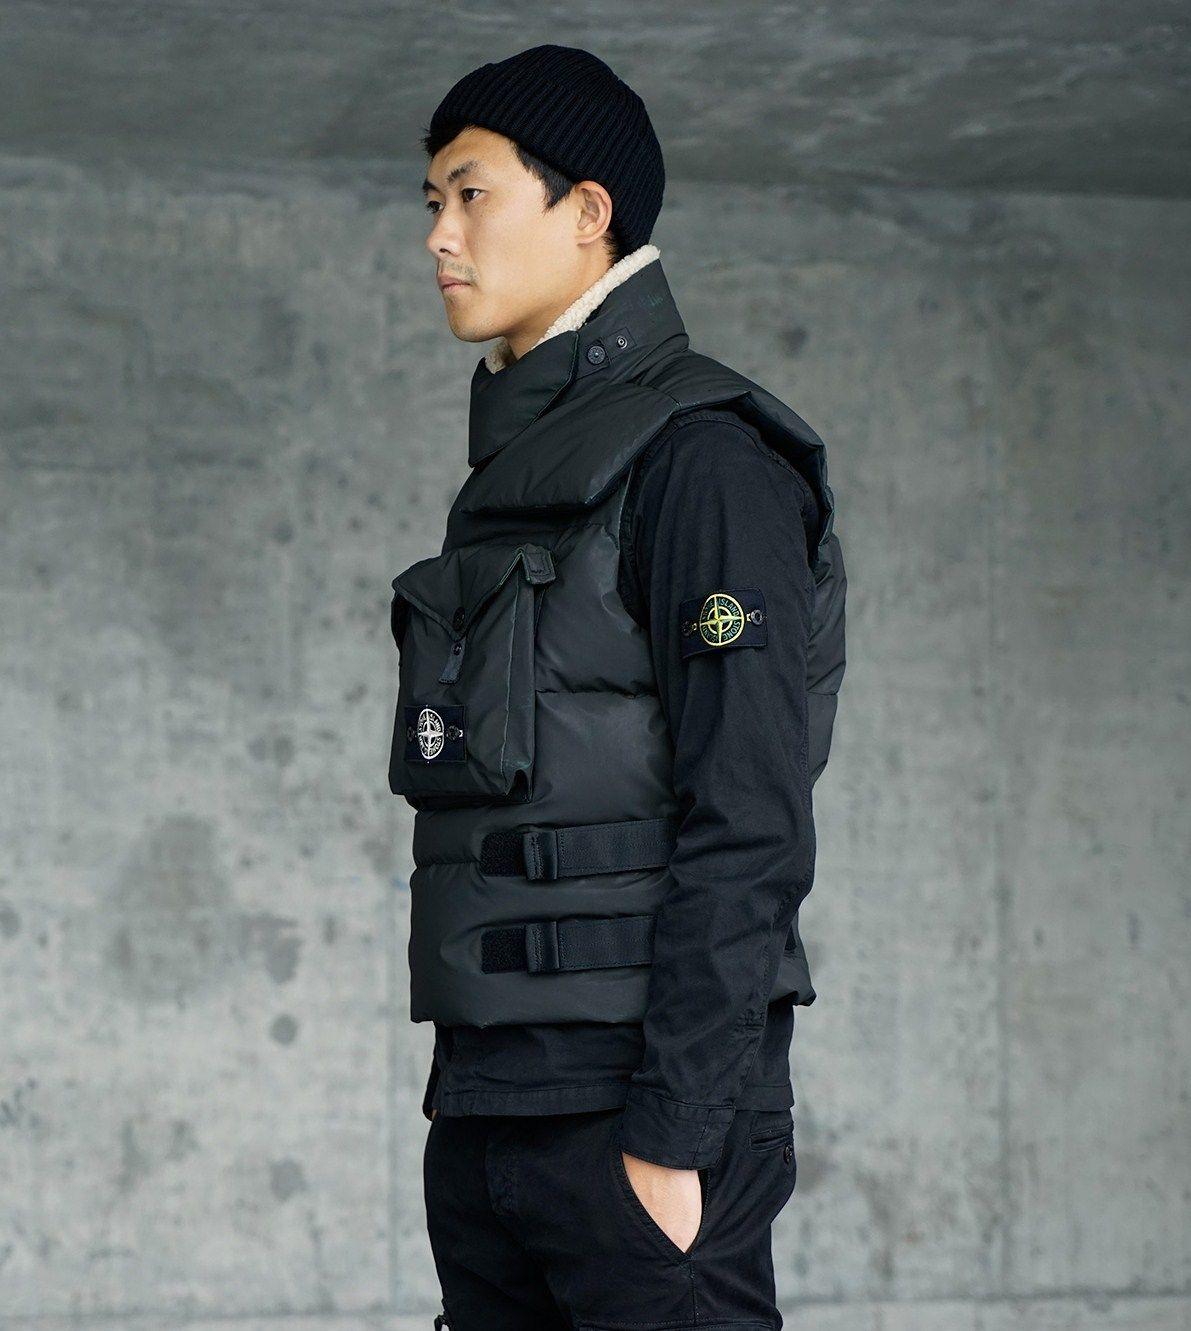 tr1yo: SI HIDDEN REFLECTIVE | Mens outfitters, Streetwear